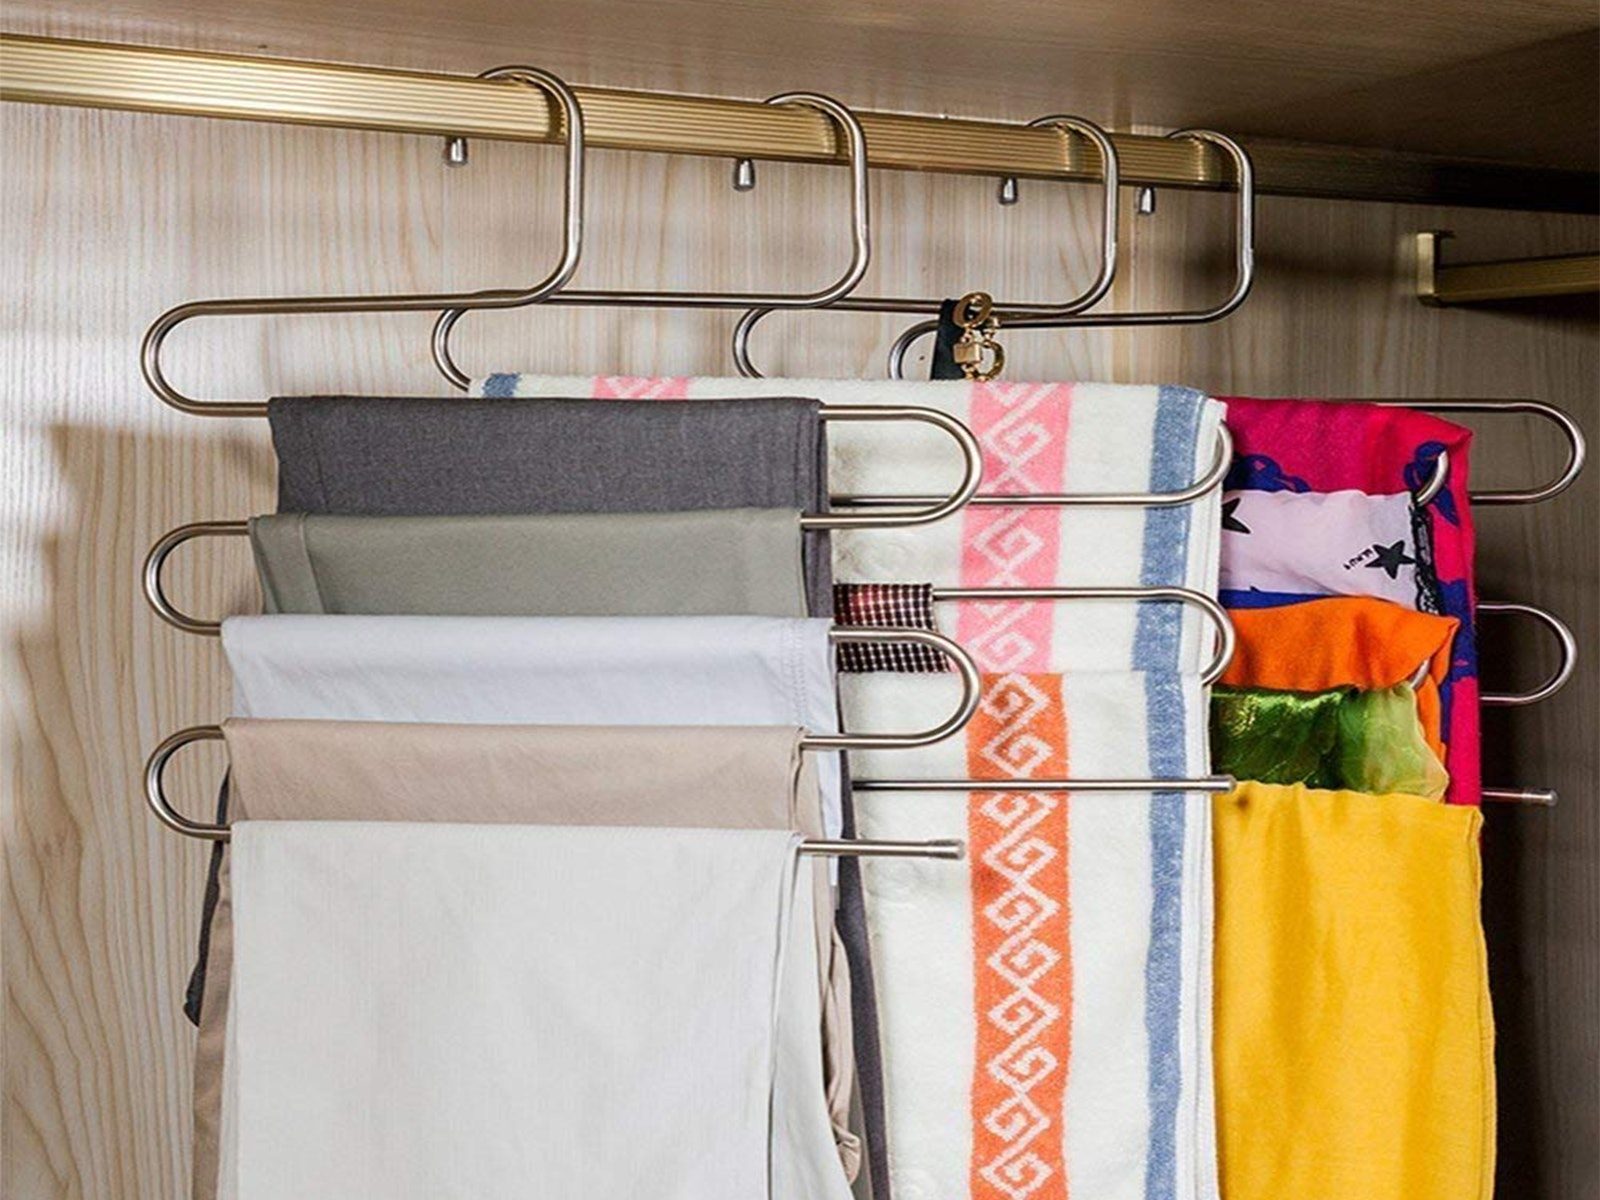 "PINK 7/"" DOLL CLOTHES HANGERS BRAND NEW three DOZEN that/'s 36 hangers"